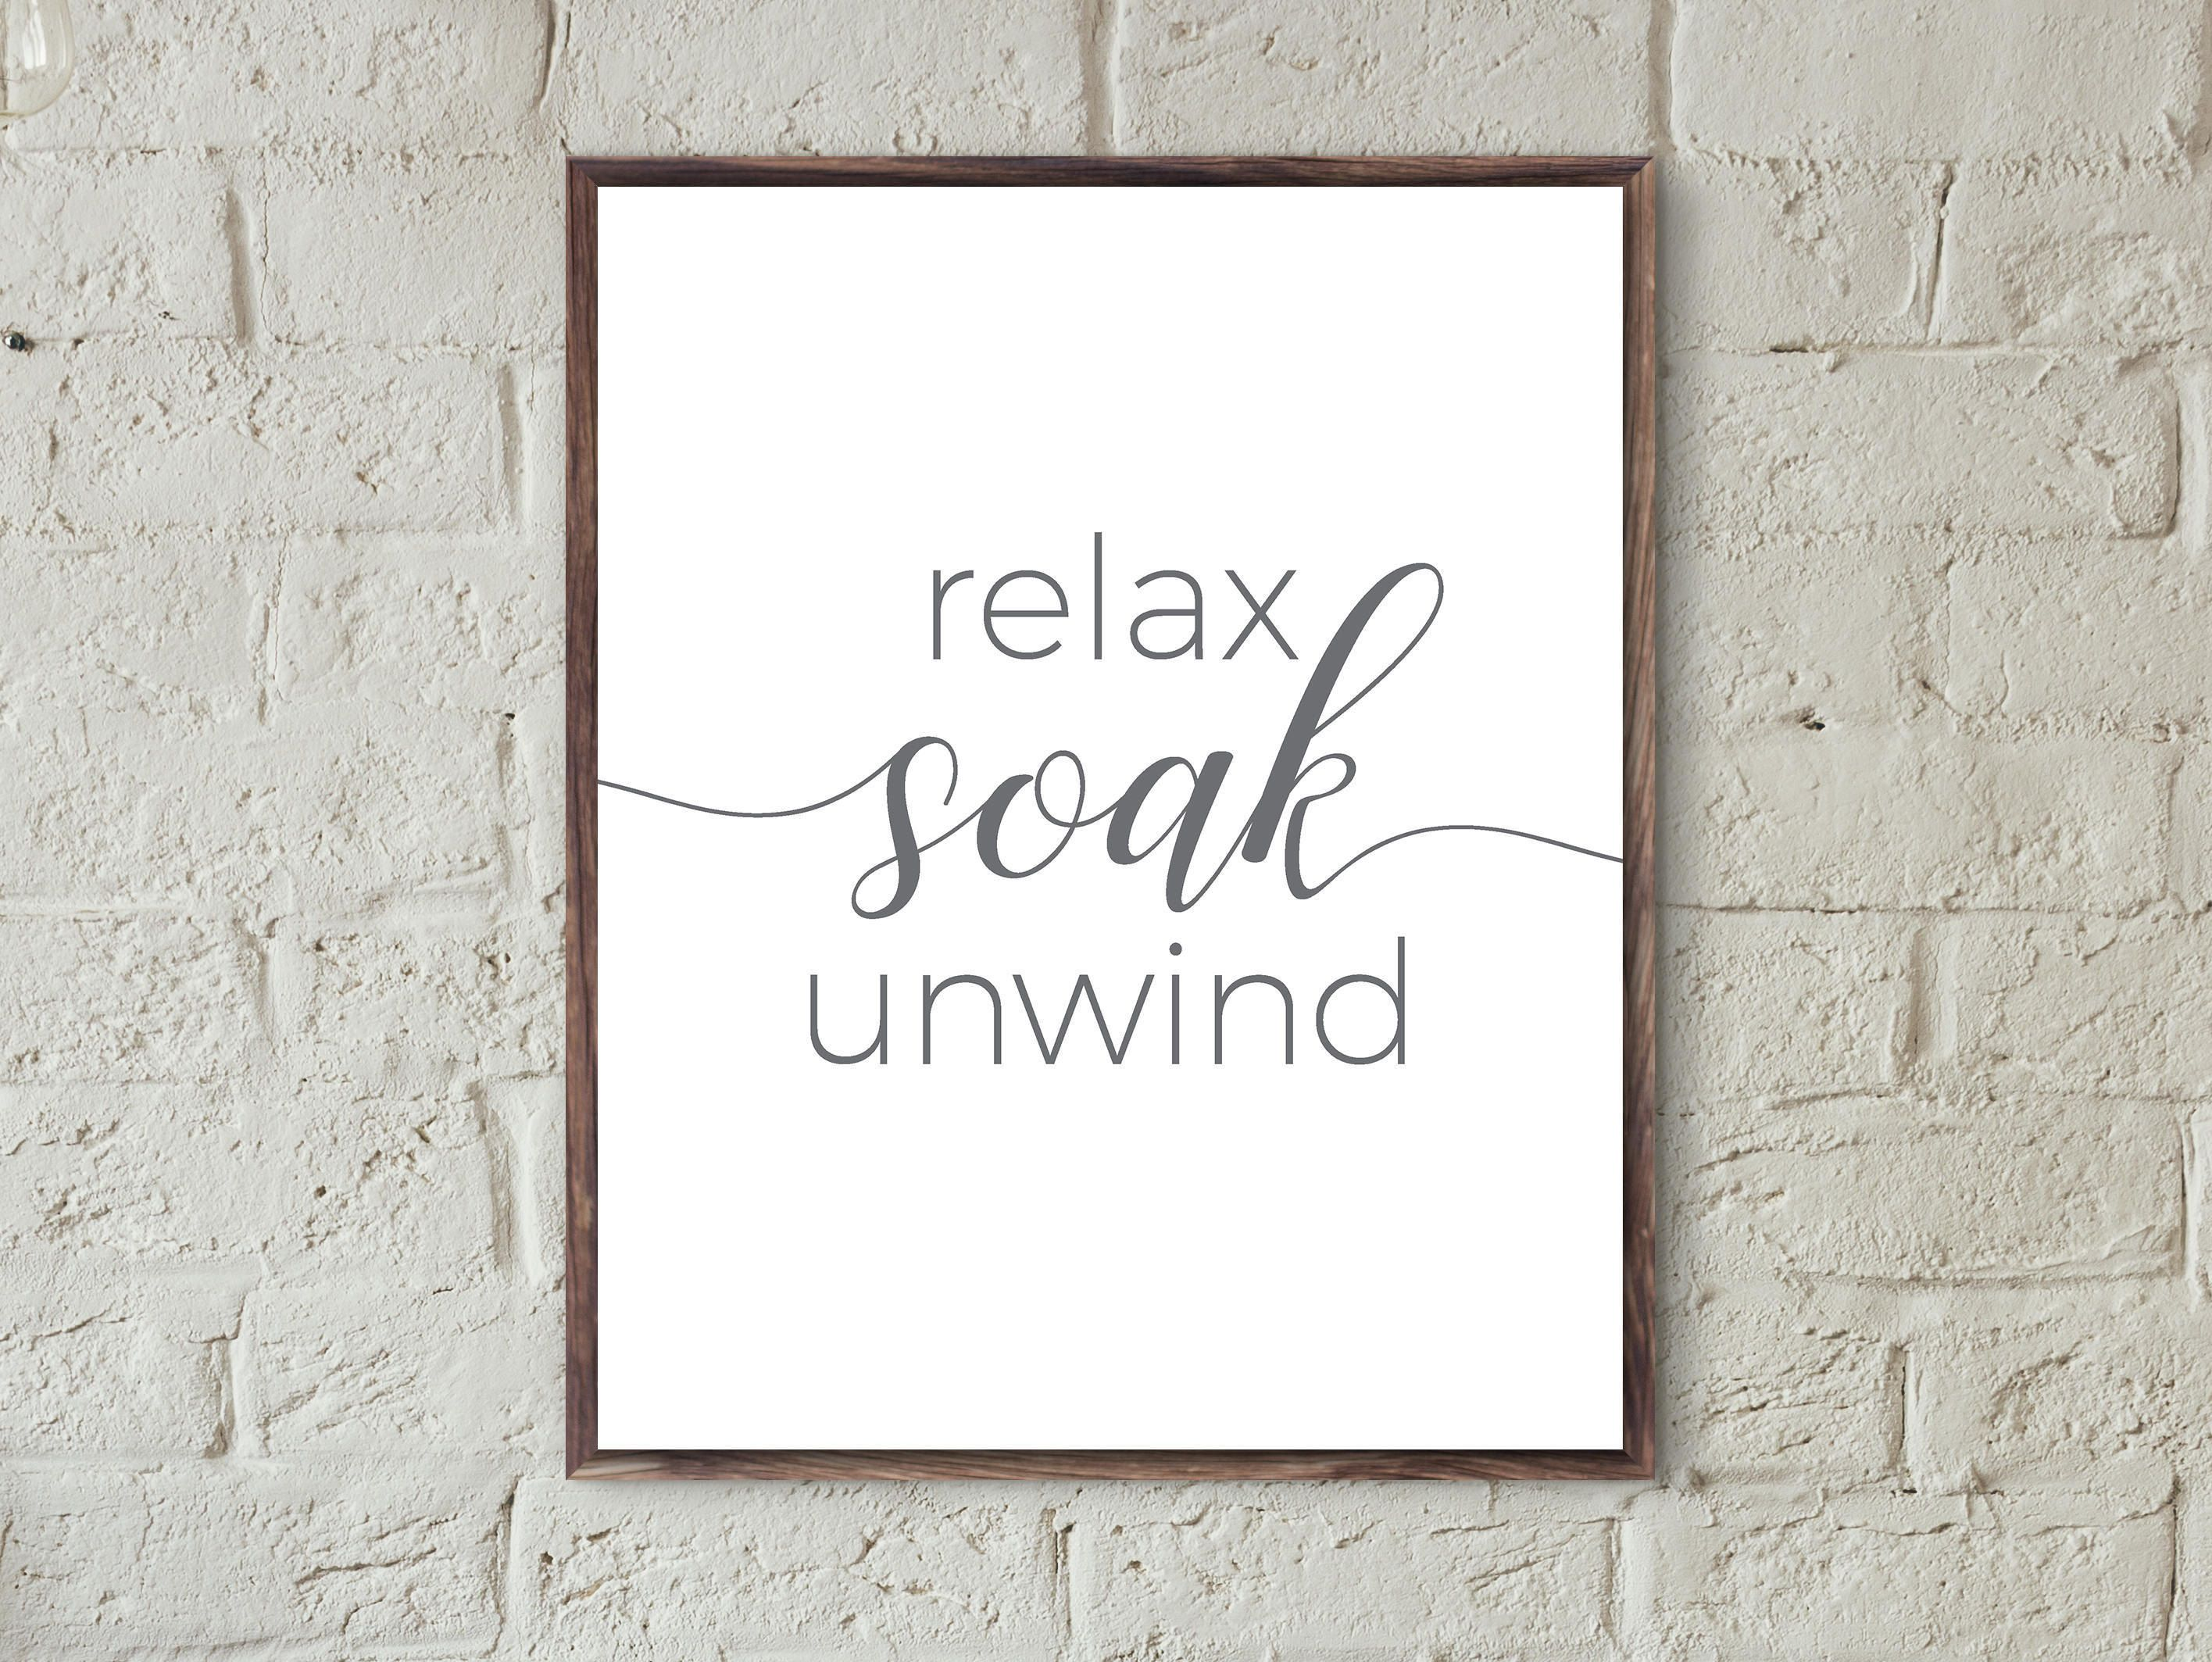 Relax Soak Unwind Bathroom Wall Art Printable Quotes Download Bathroom Decor Sign Guest Room Decor Re Relax Soak Unwind Relax Wall Art Printable Bathroom Signs